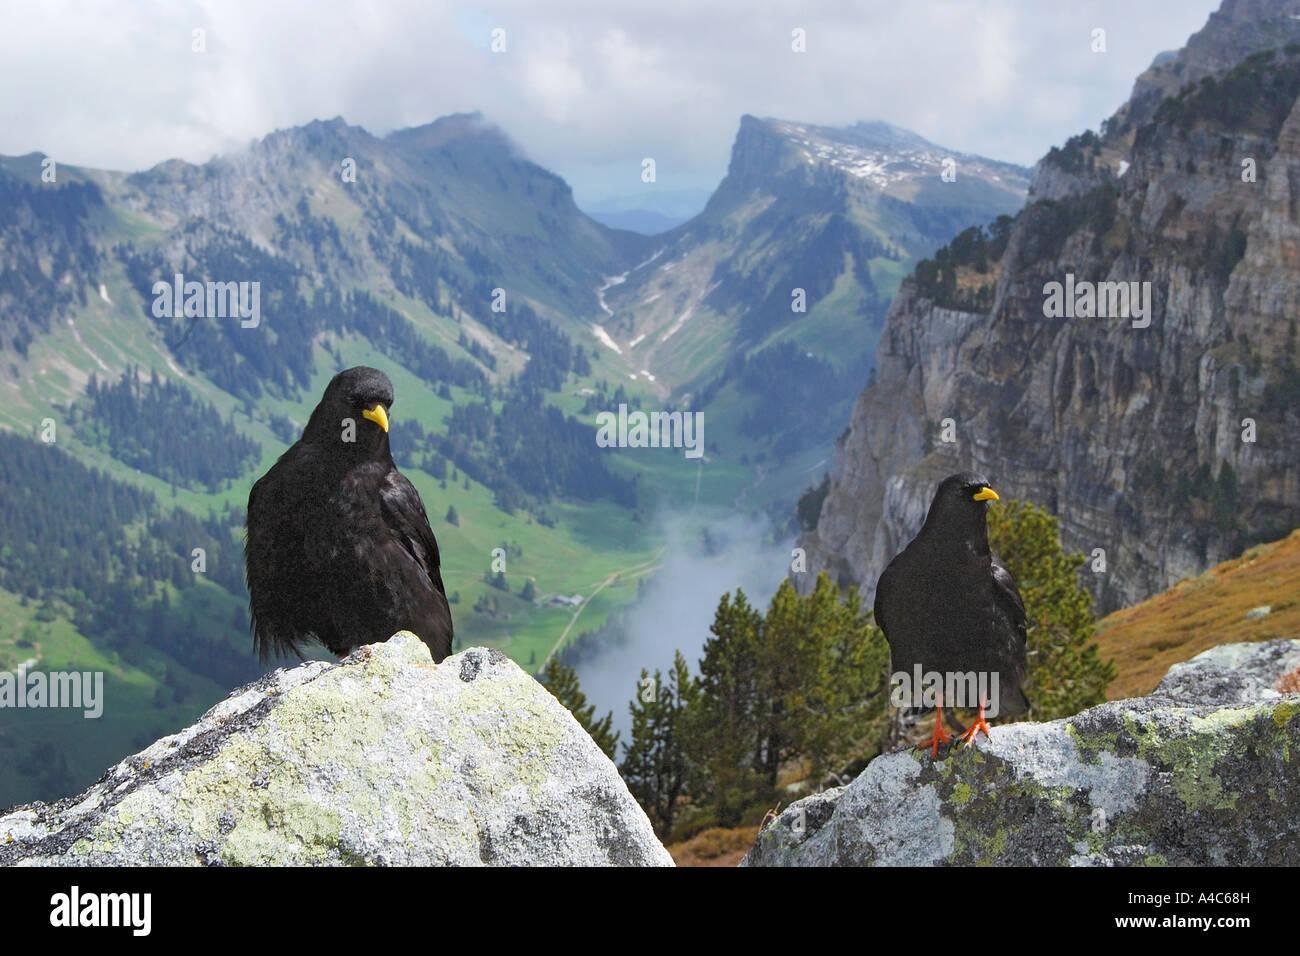 Yellow billed Choughs, Alpine Choughs (Pyrrhocorax garculus) in mountain scenery - Stock Image